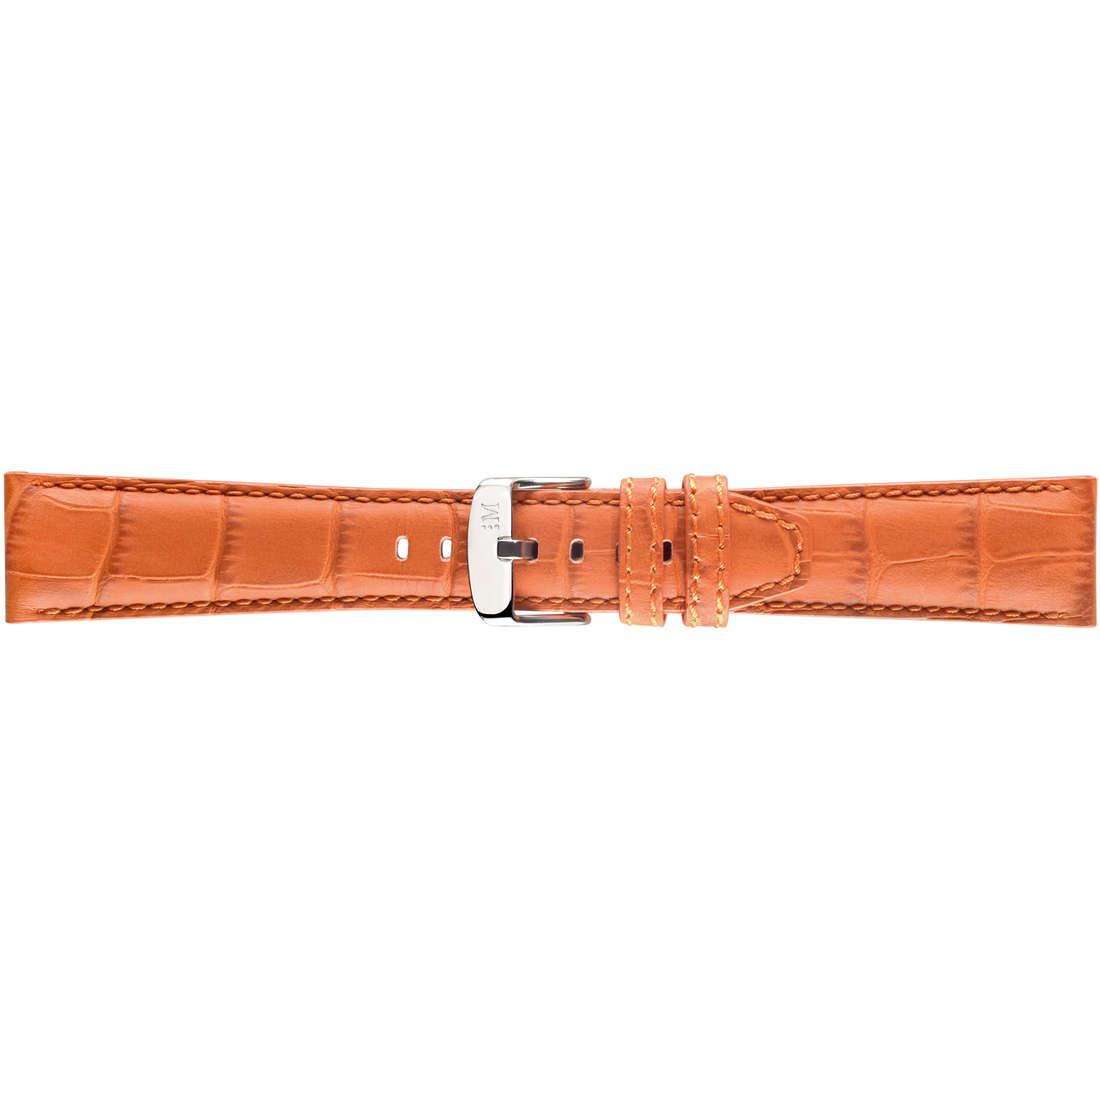 montre bande de montres homme Morellato Linea Sport A01X4497B44086CR18